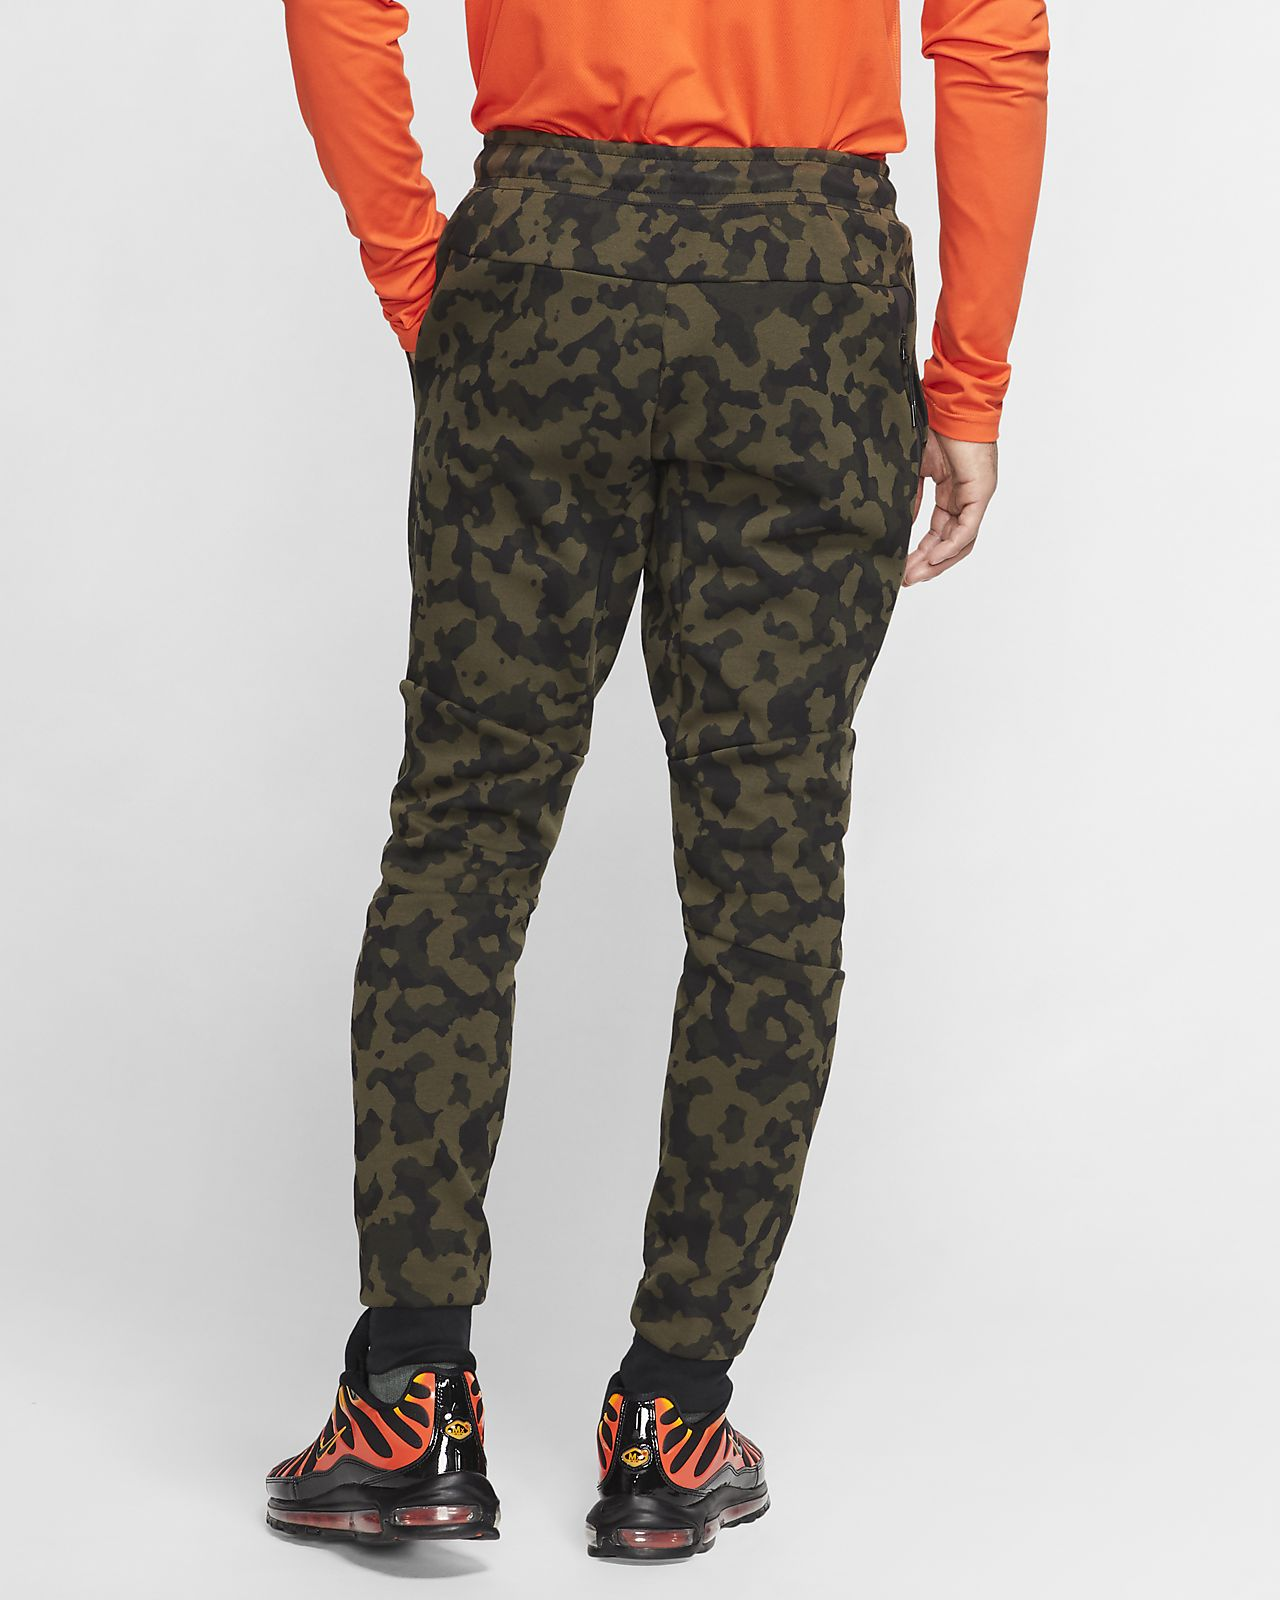 Nike Men Sportswear Camo Print Fleece Hoodie | Nike clothes